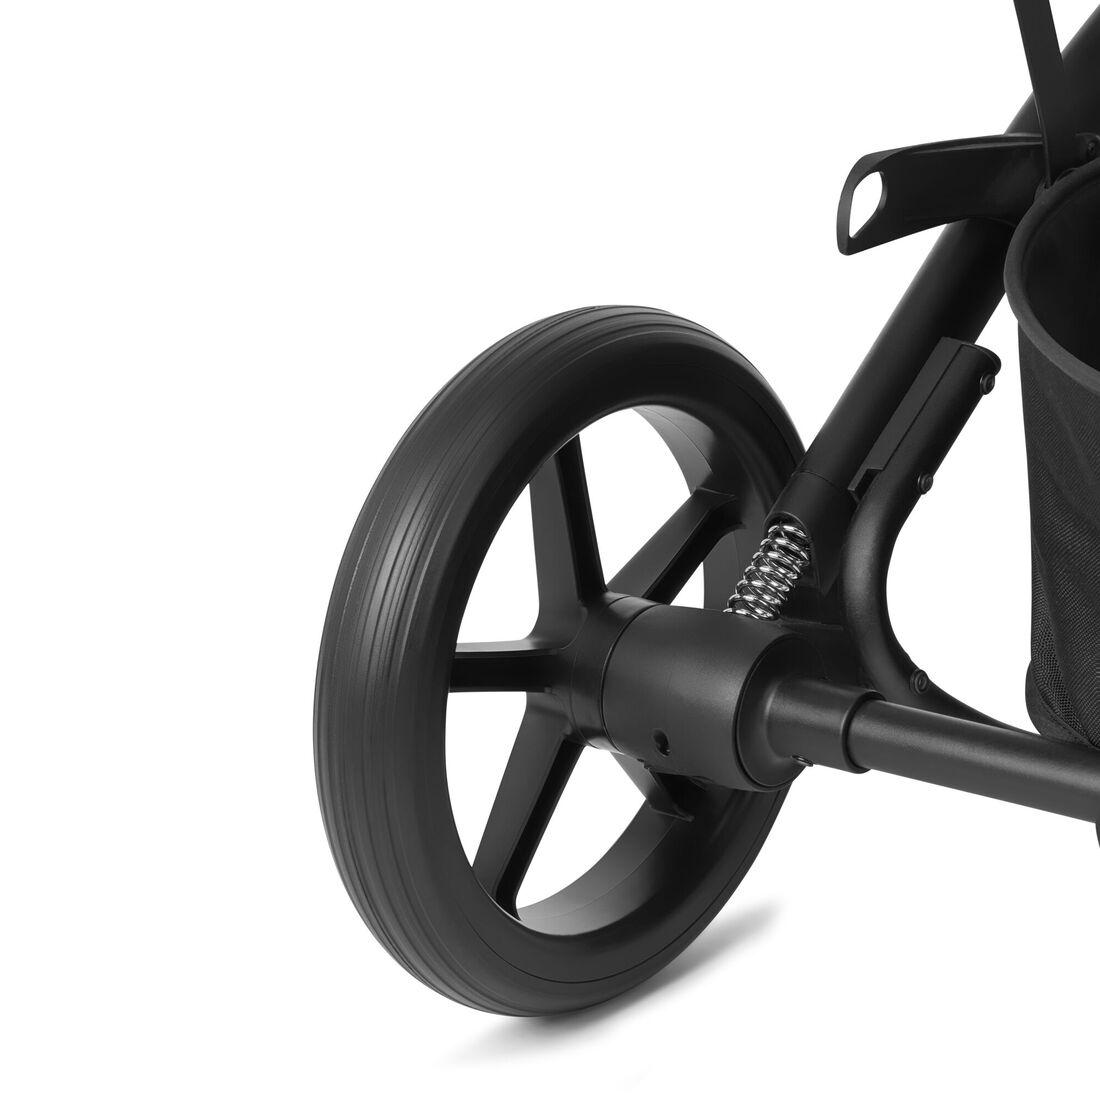 CYBEX Balios S Lux - Soho Grey (Black Frame) in Soho Grey (Black Frame) large image number 8